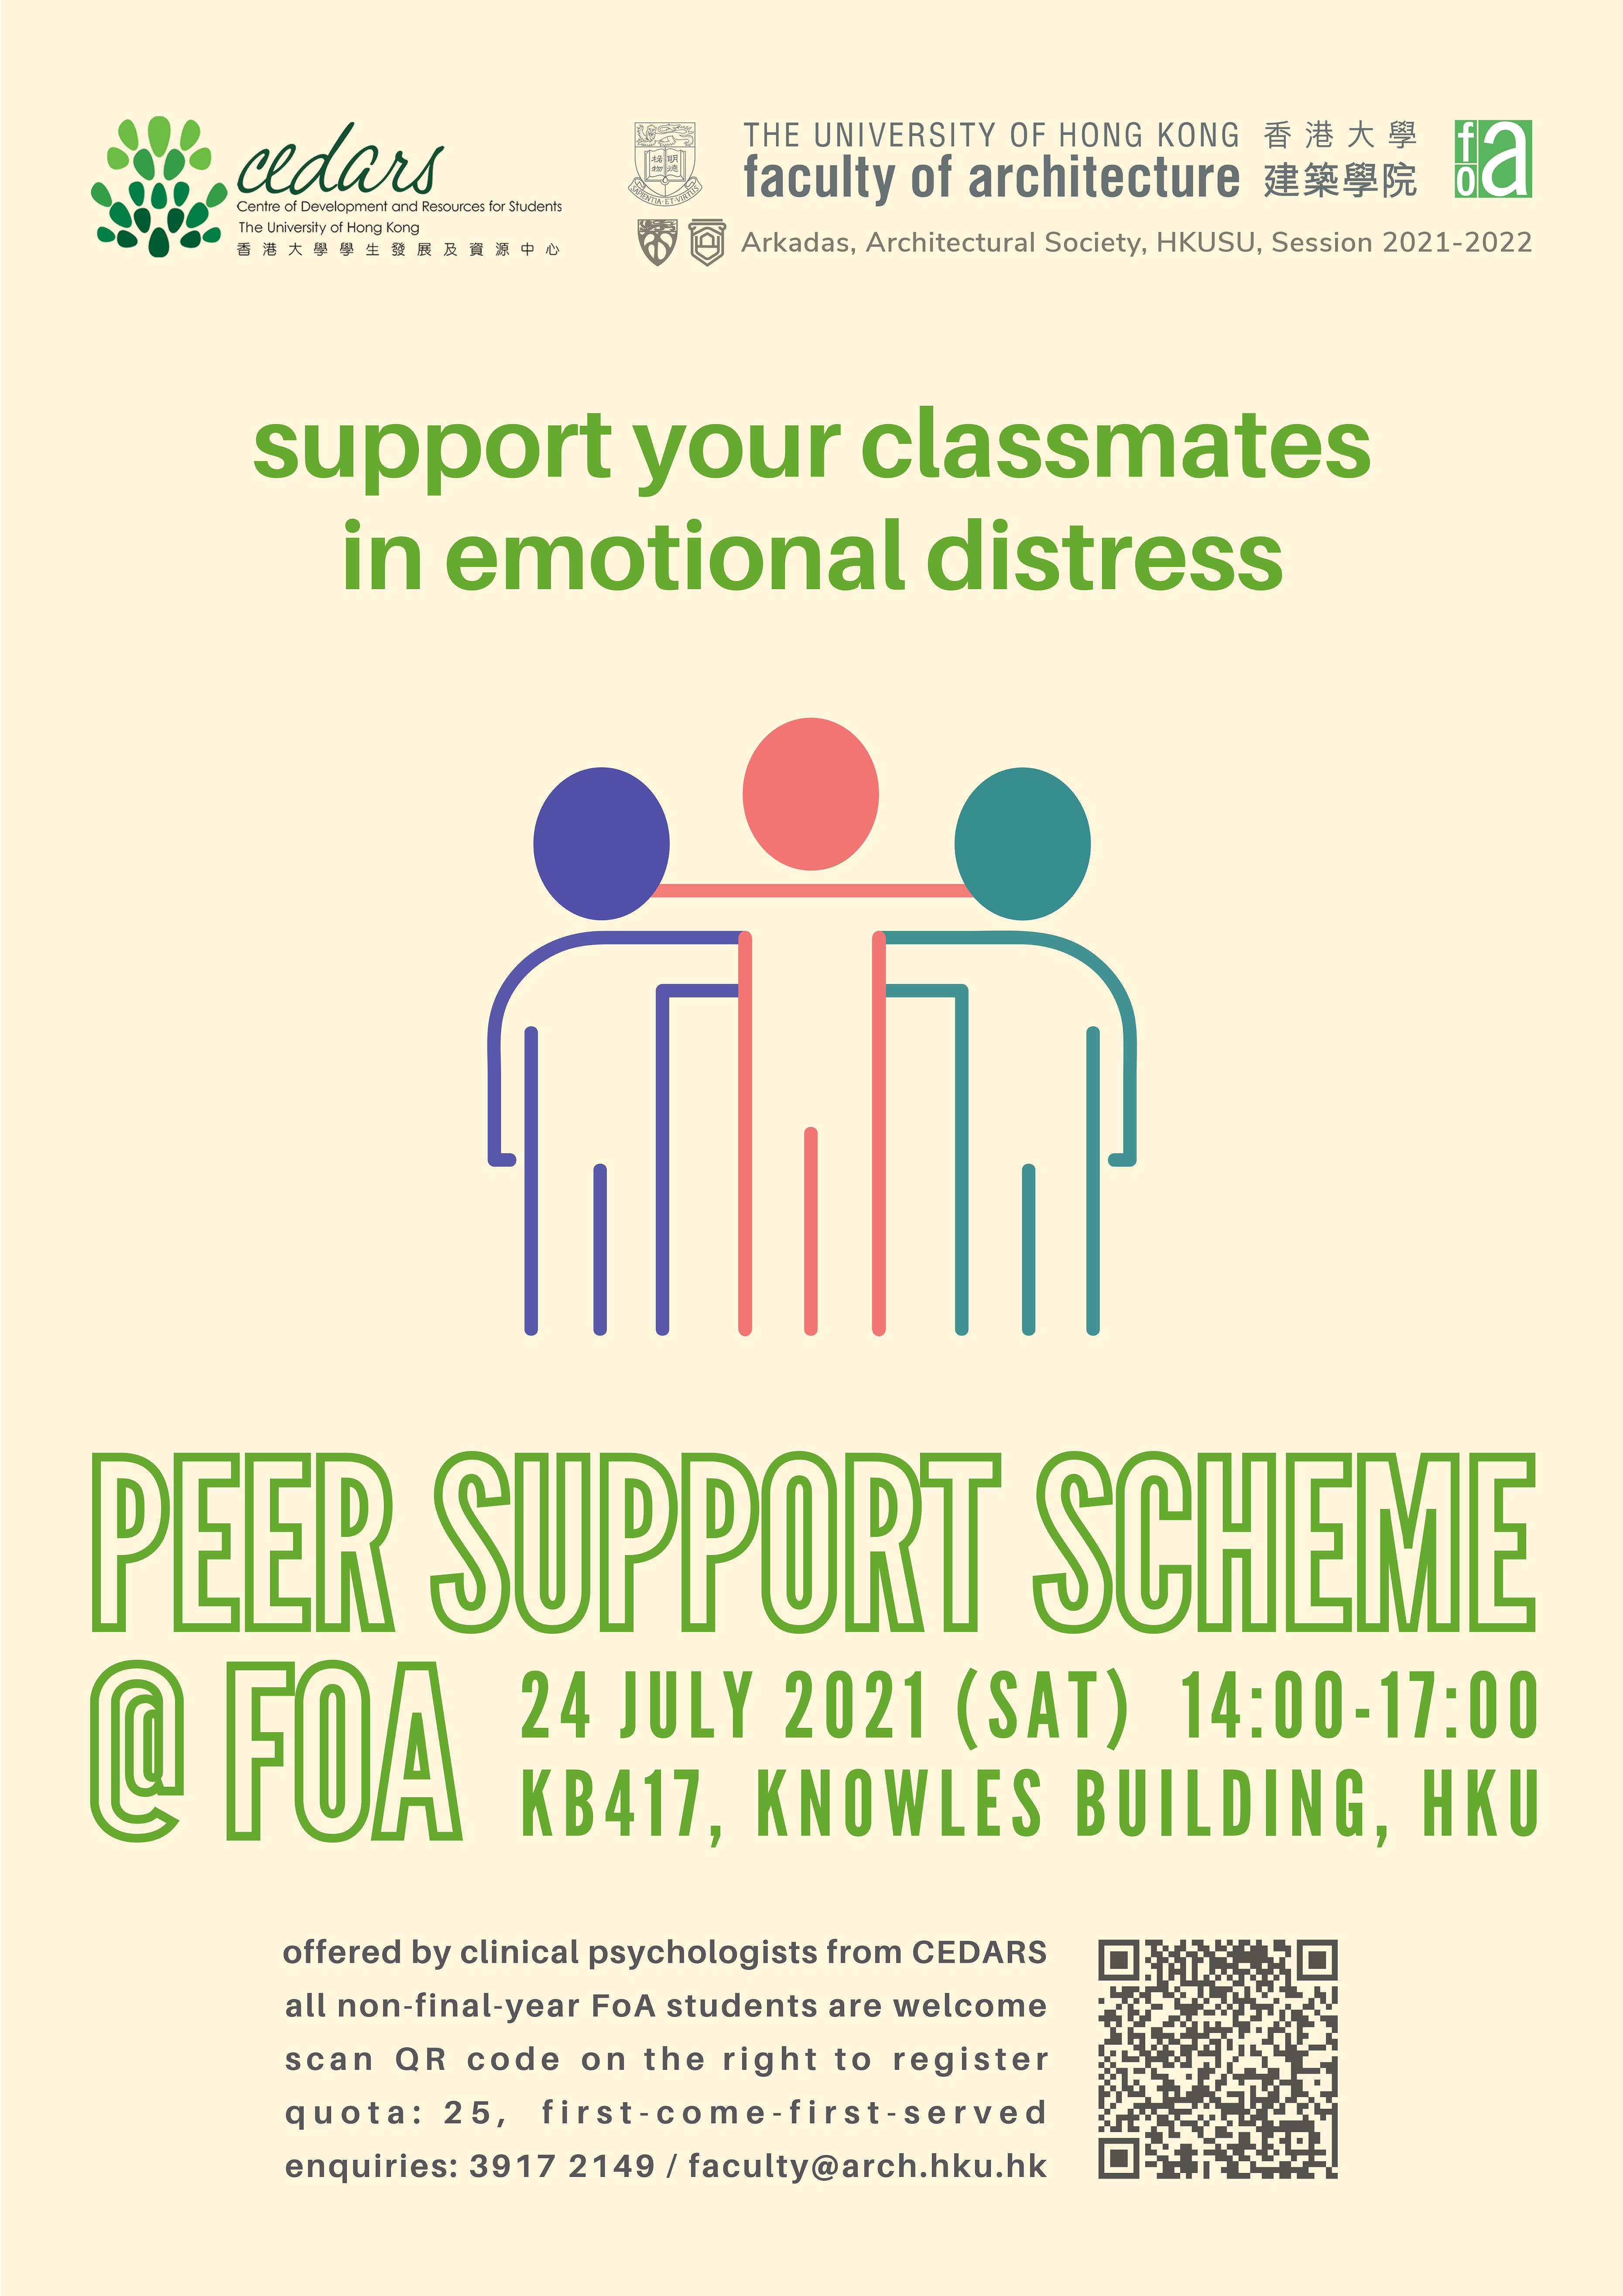 Peer Support Scheme @ FoA